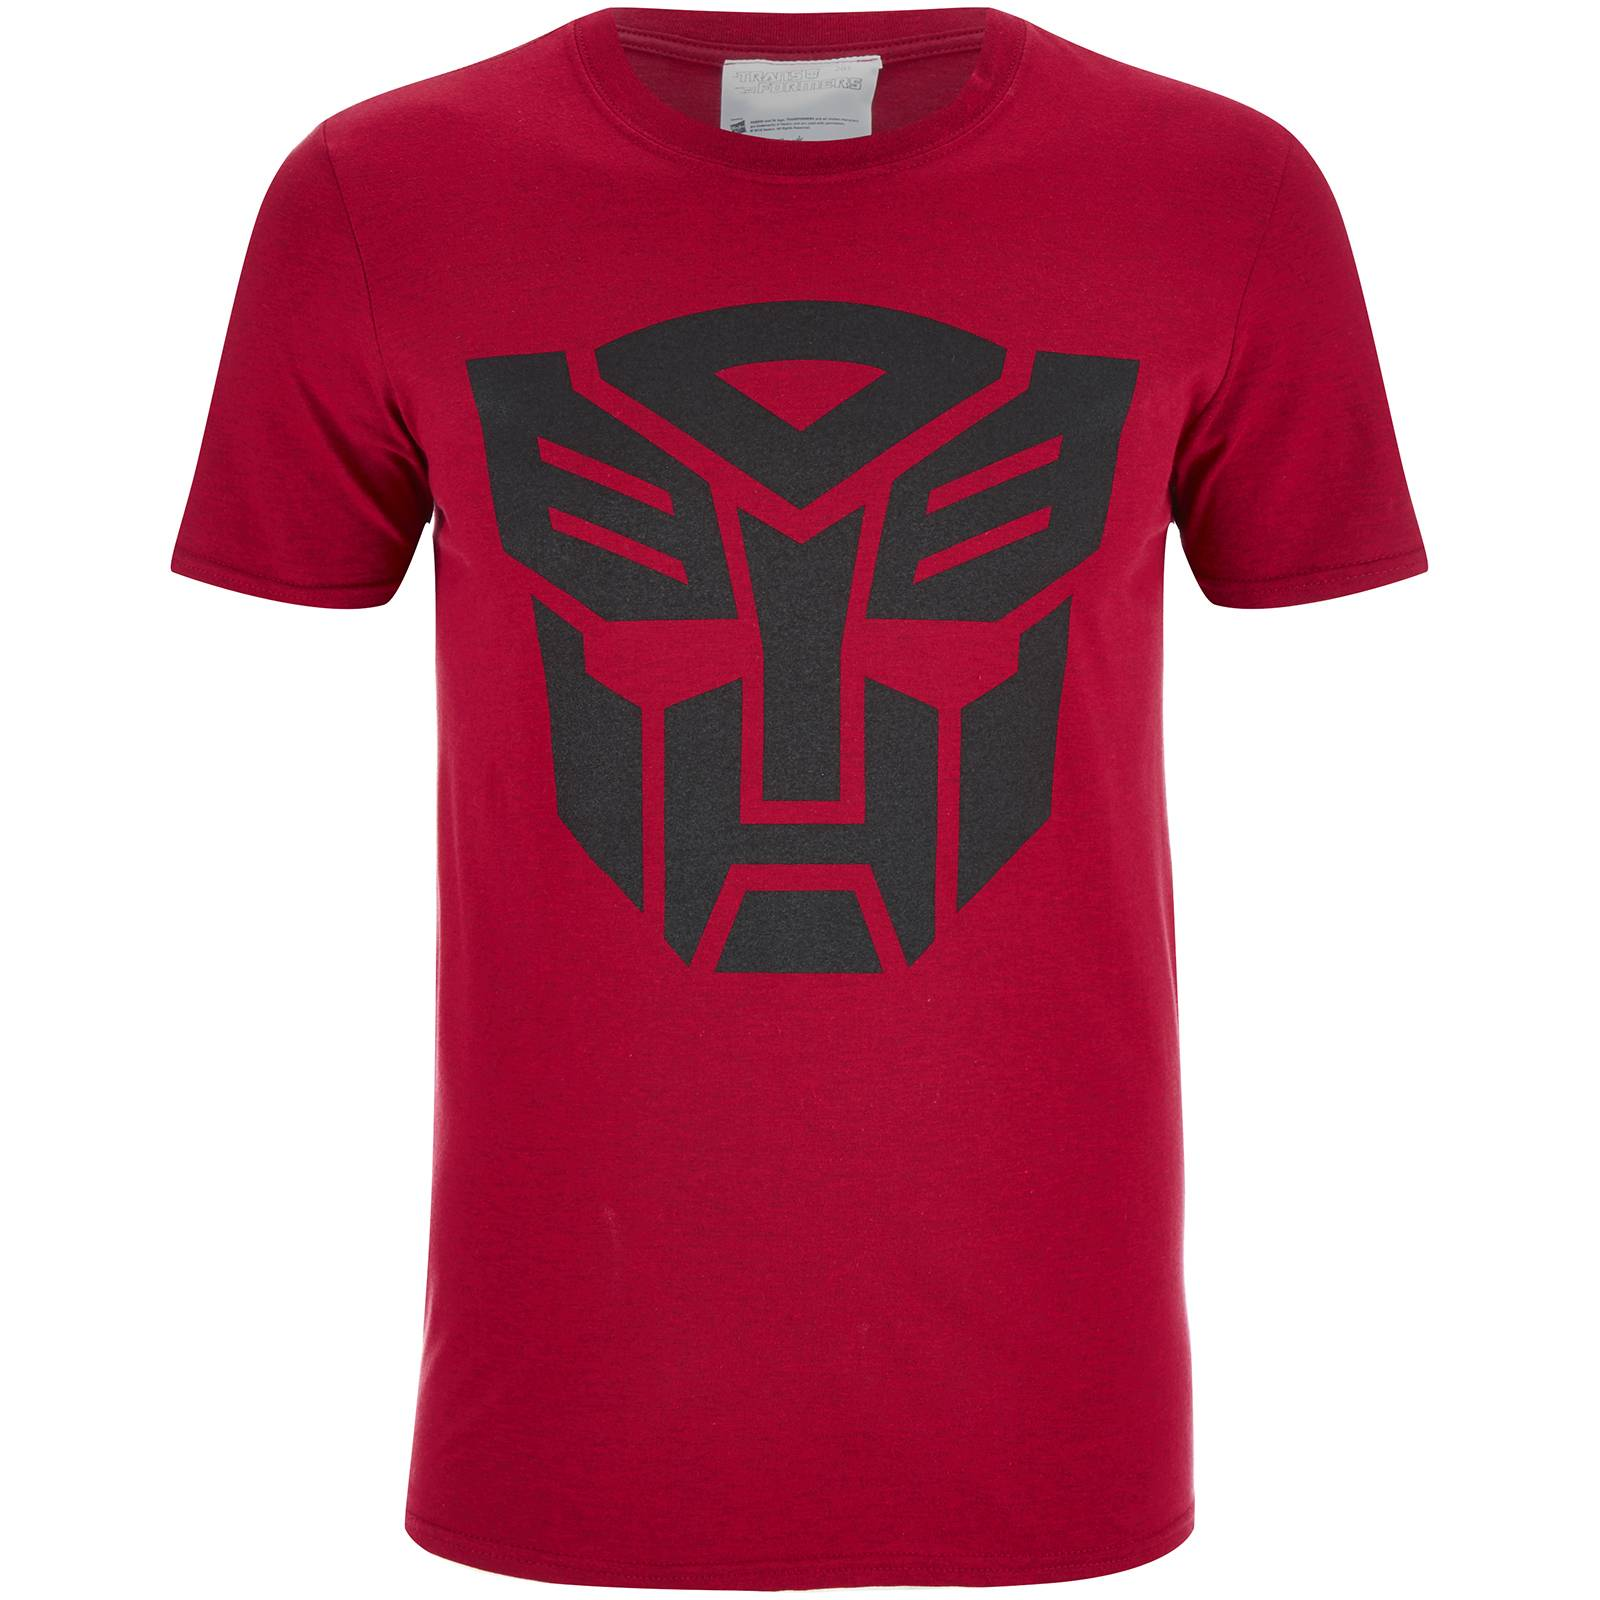 Geek Clothing Transformers Men's Transformers Black Emblem T-Shirt - Red - S - Red